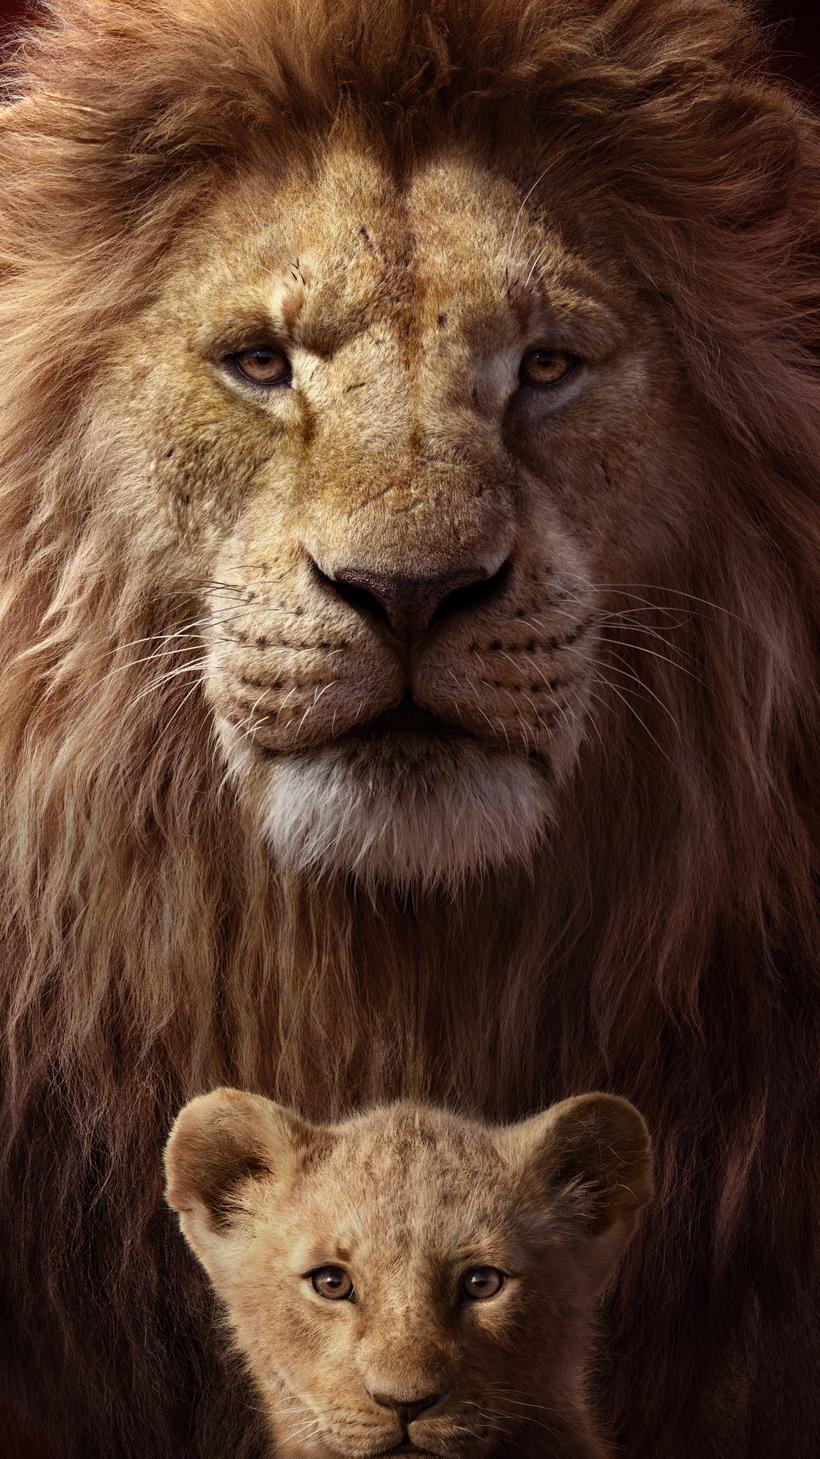 The Lion King 2019 Phone Wallpaper In 2020 The Lion King Leeuwenkoning Leeuw Fotografie